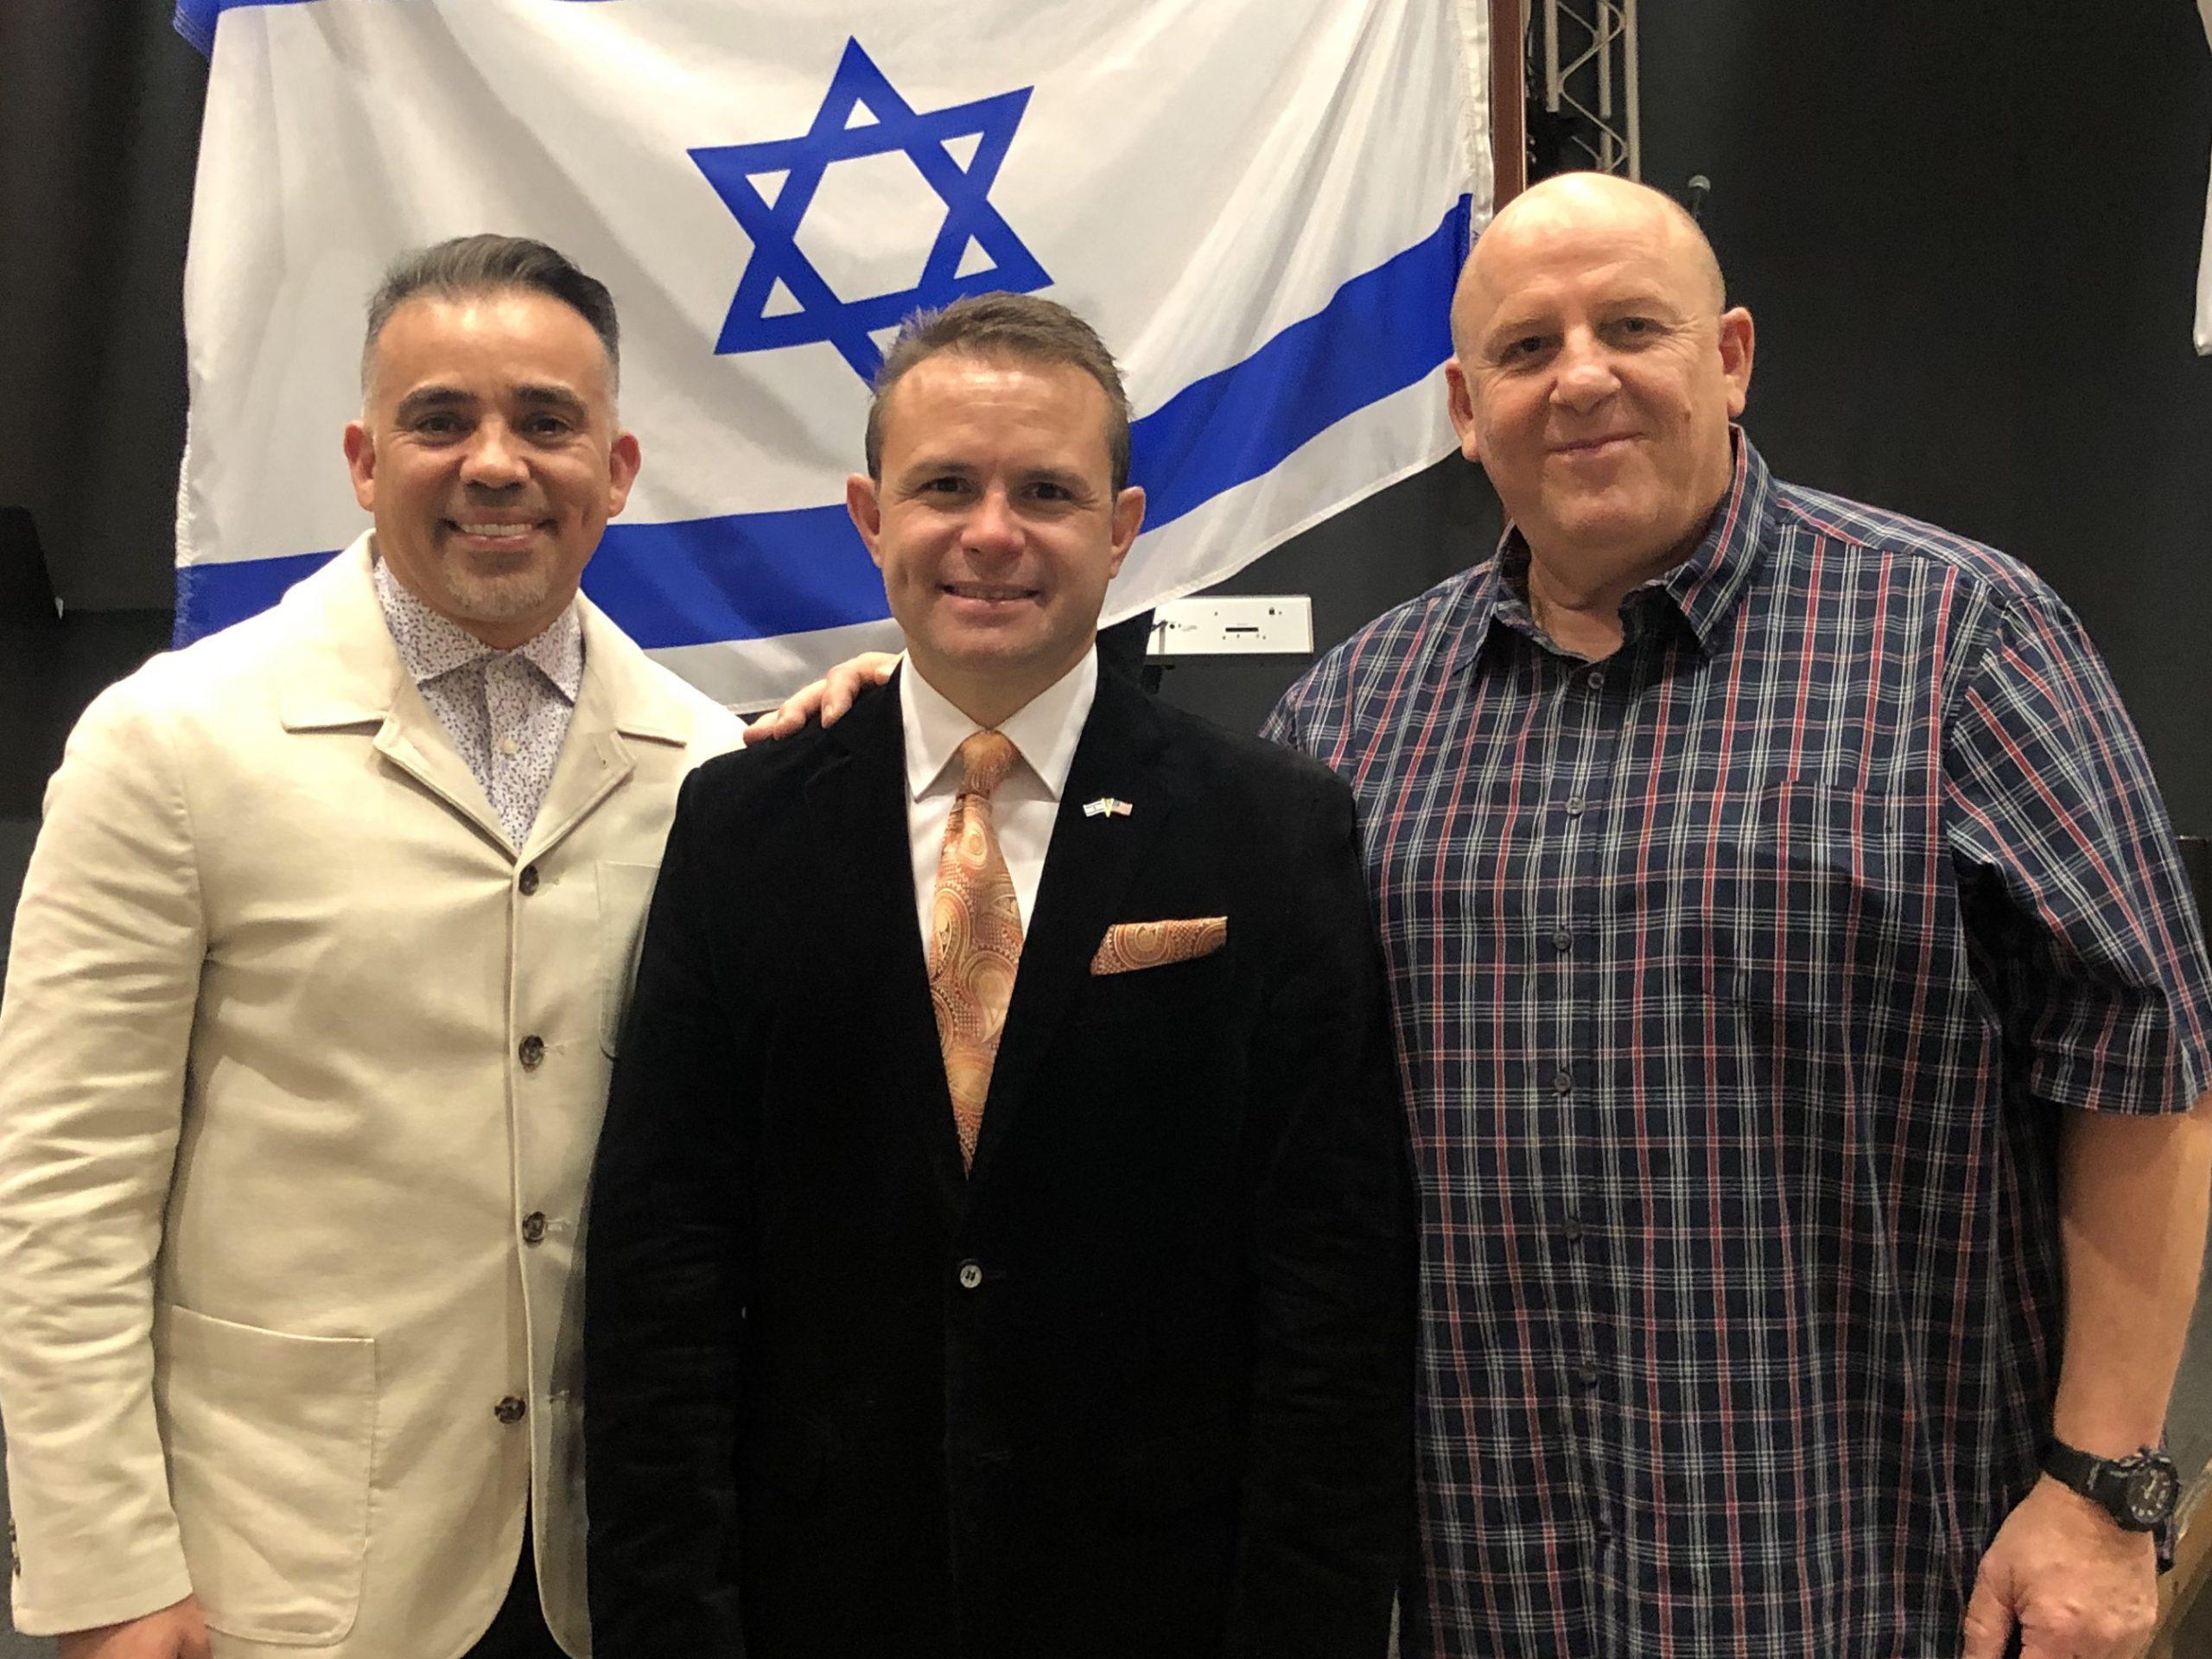 April 17 - Garland, TX - Why Israel Bilingual